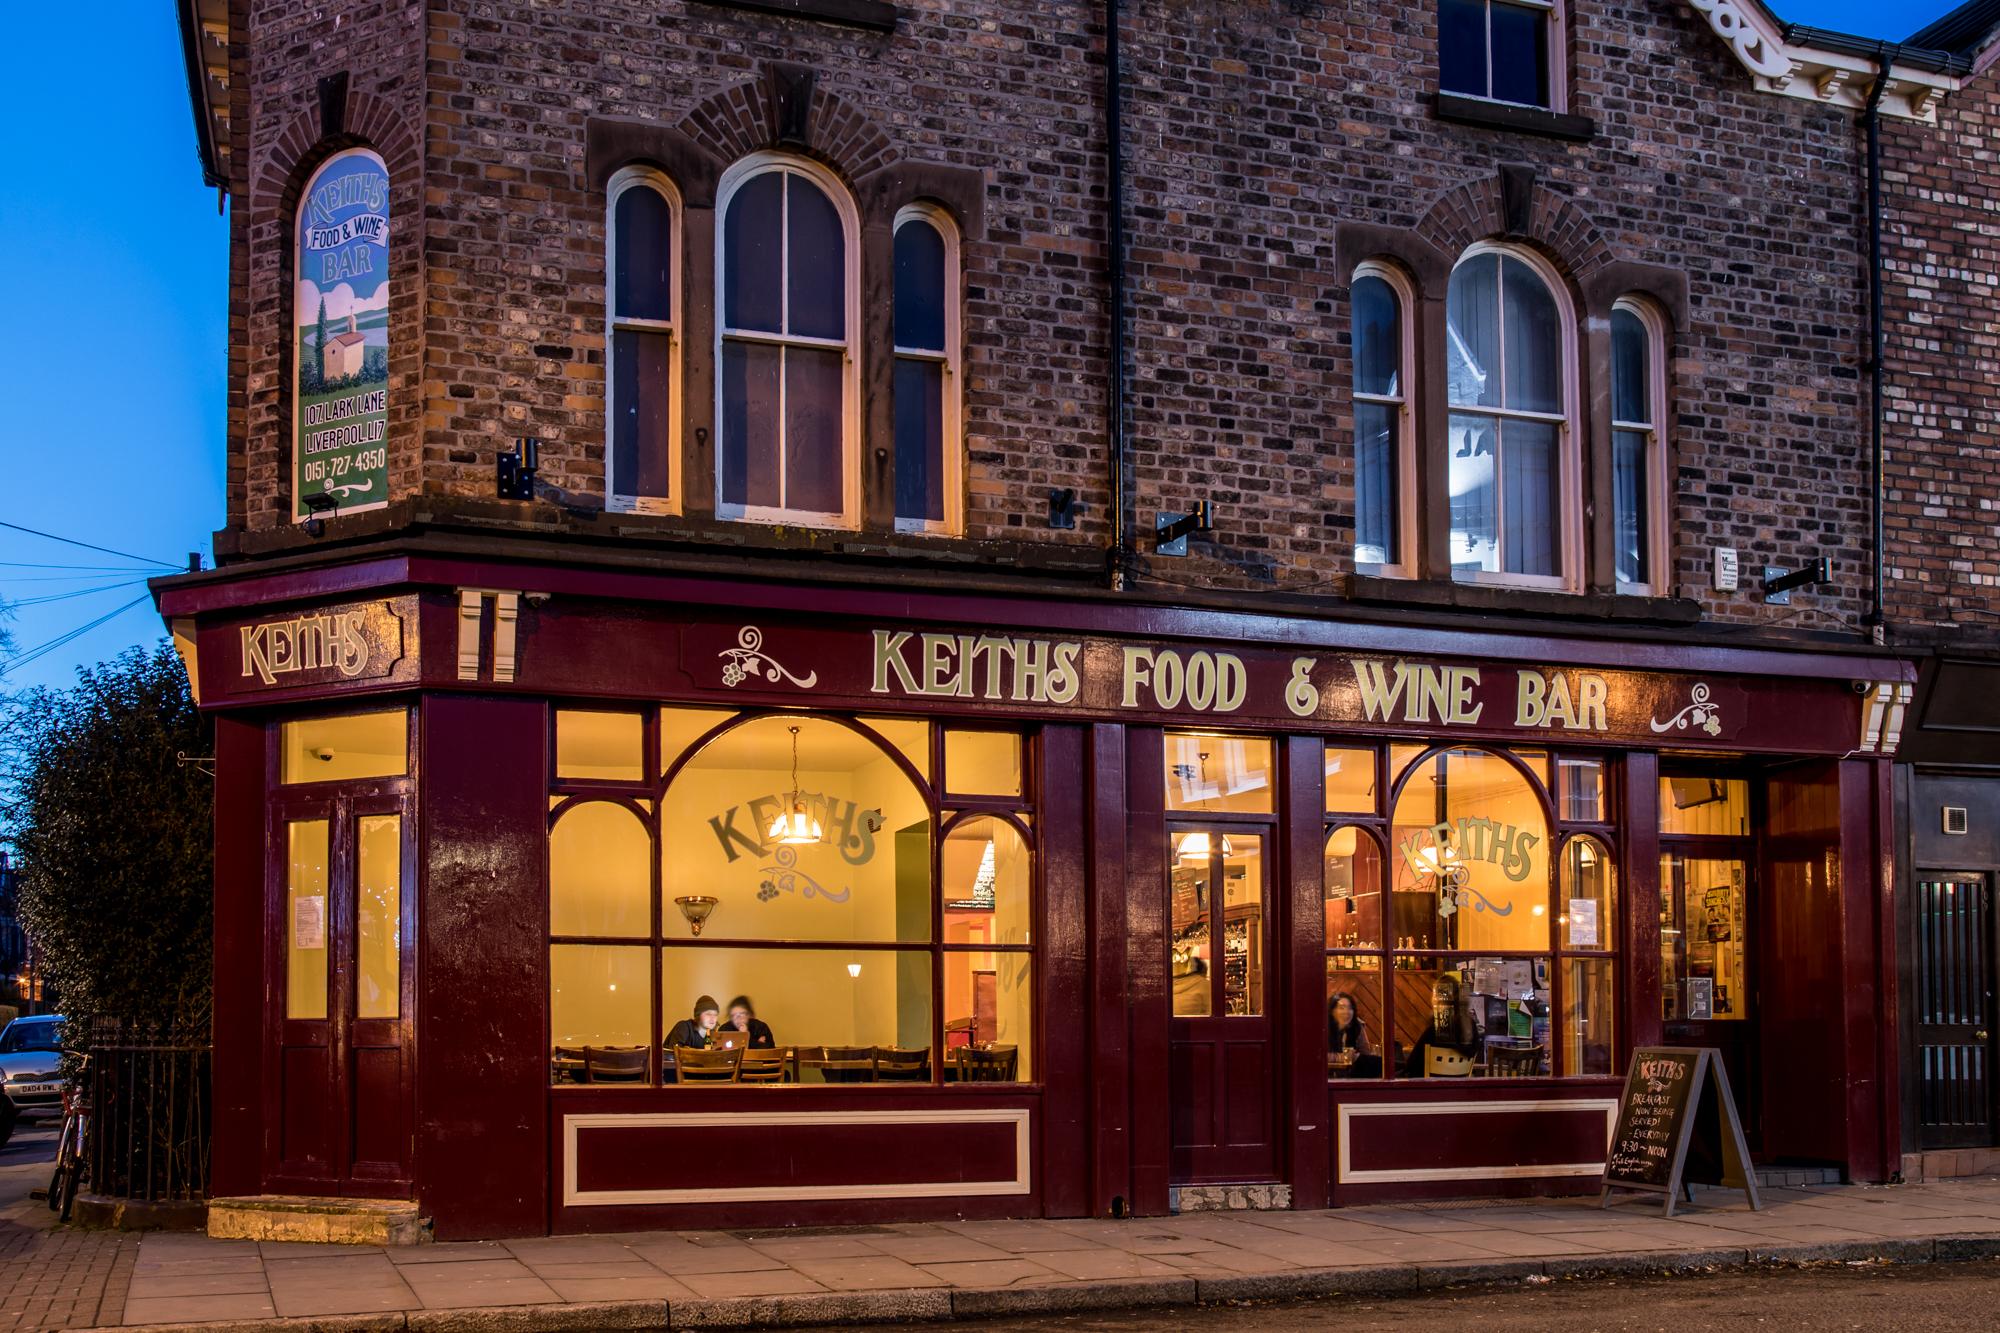 Keith's Food and Wine Bar